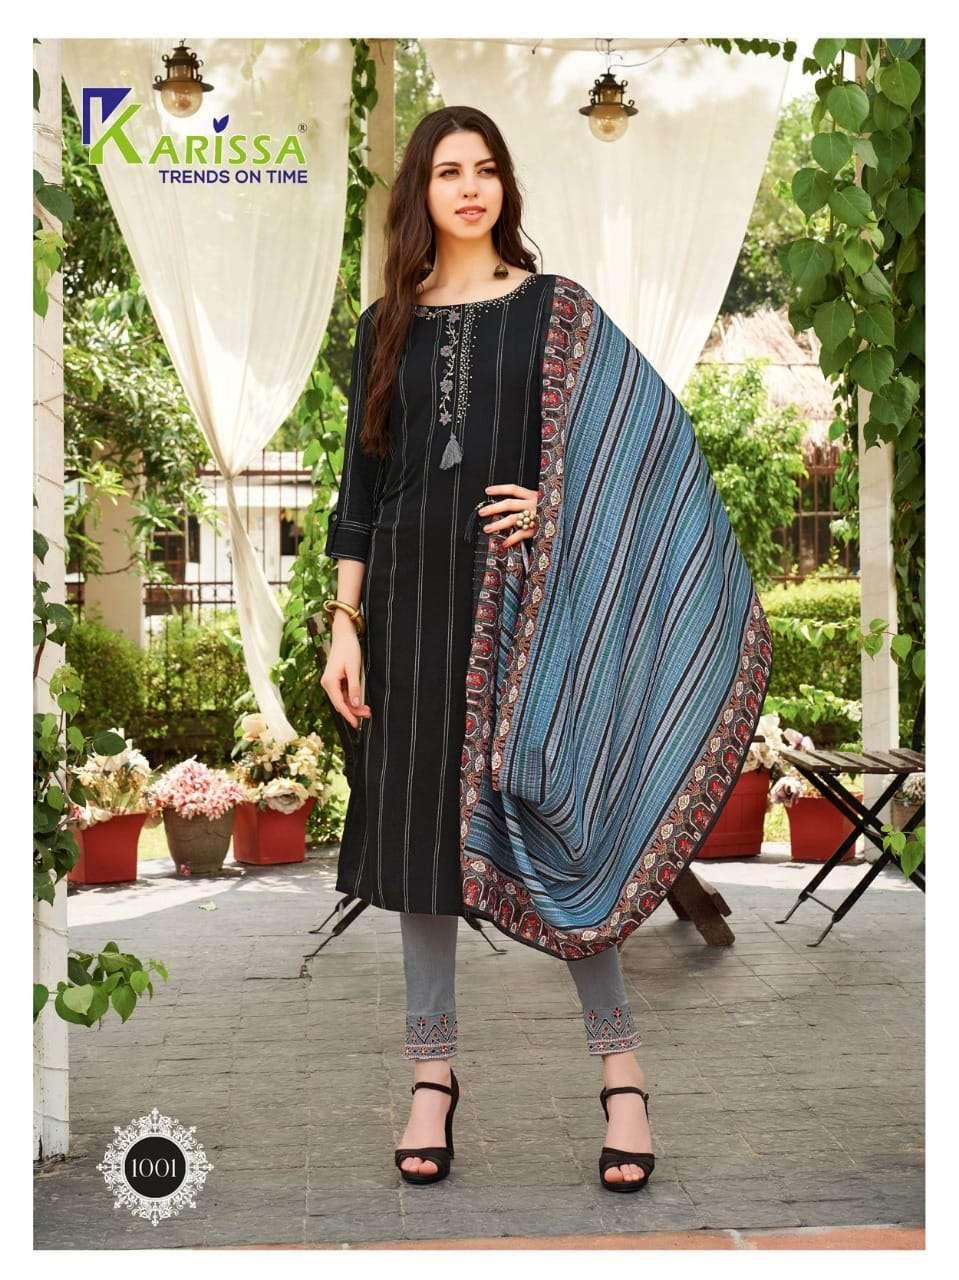 Karissa Bombay Beauty Viscose rayon With Work Kurti With Pant Dupatta Collection